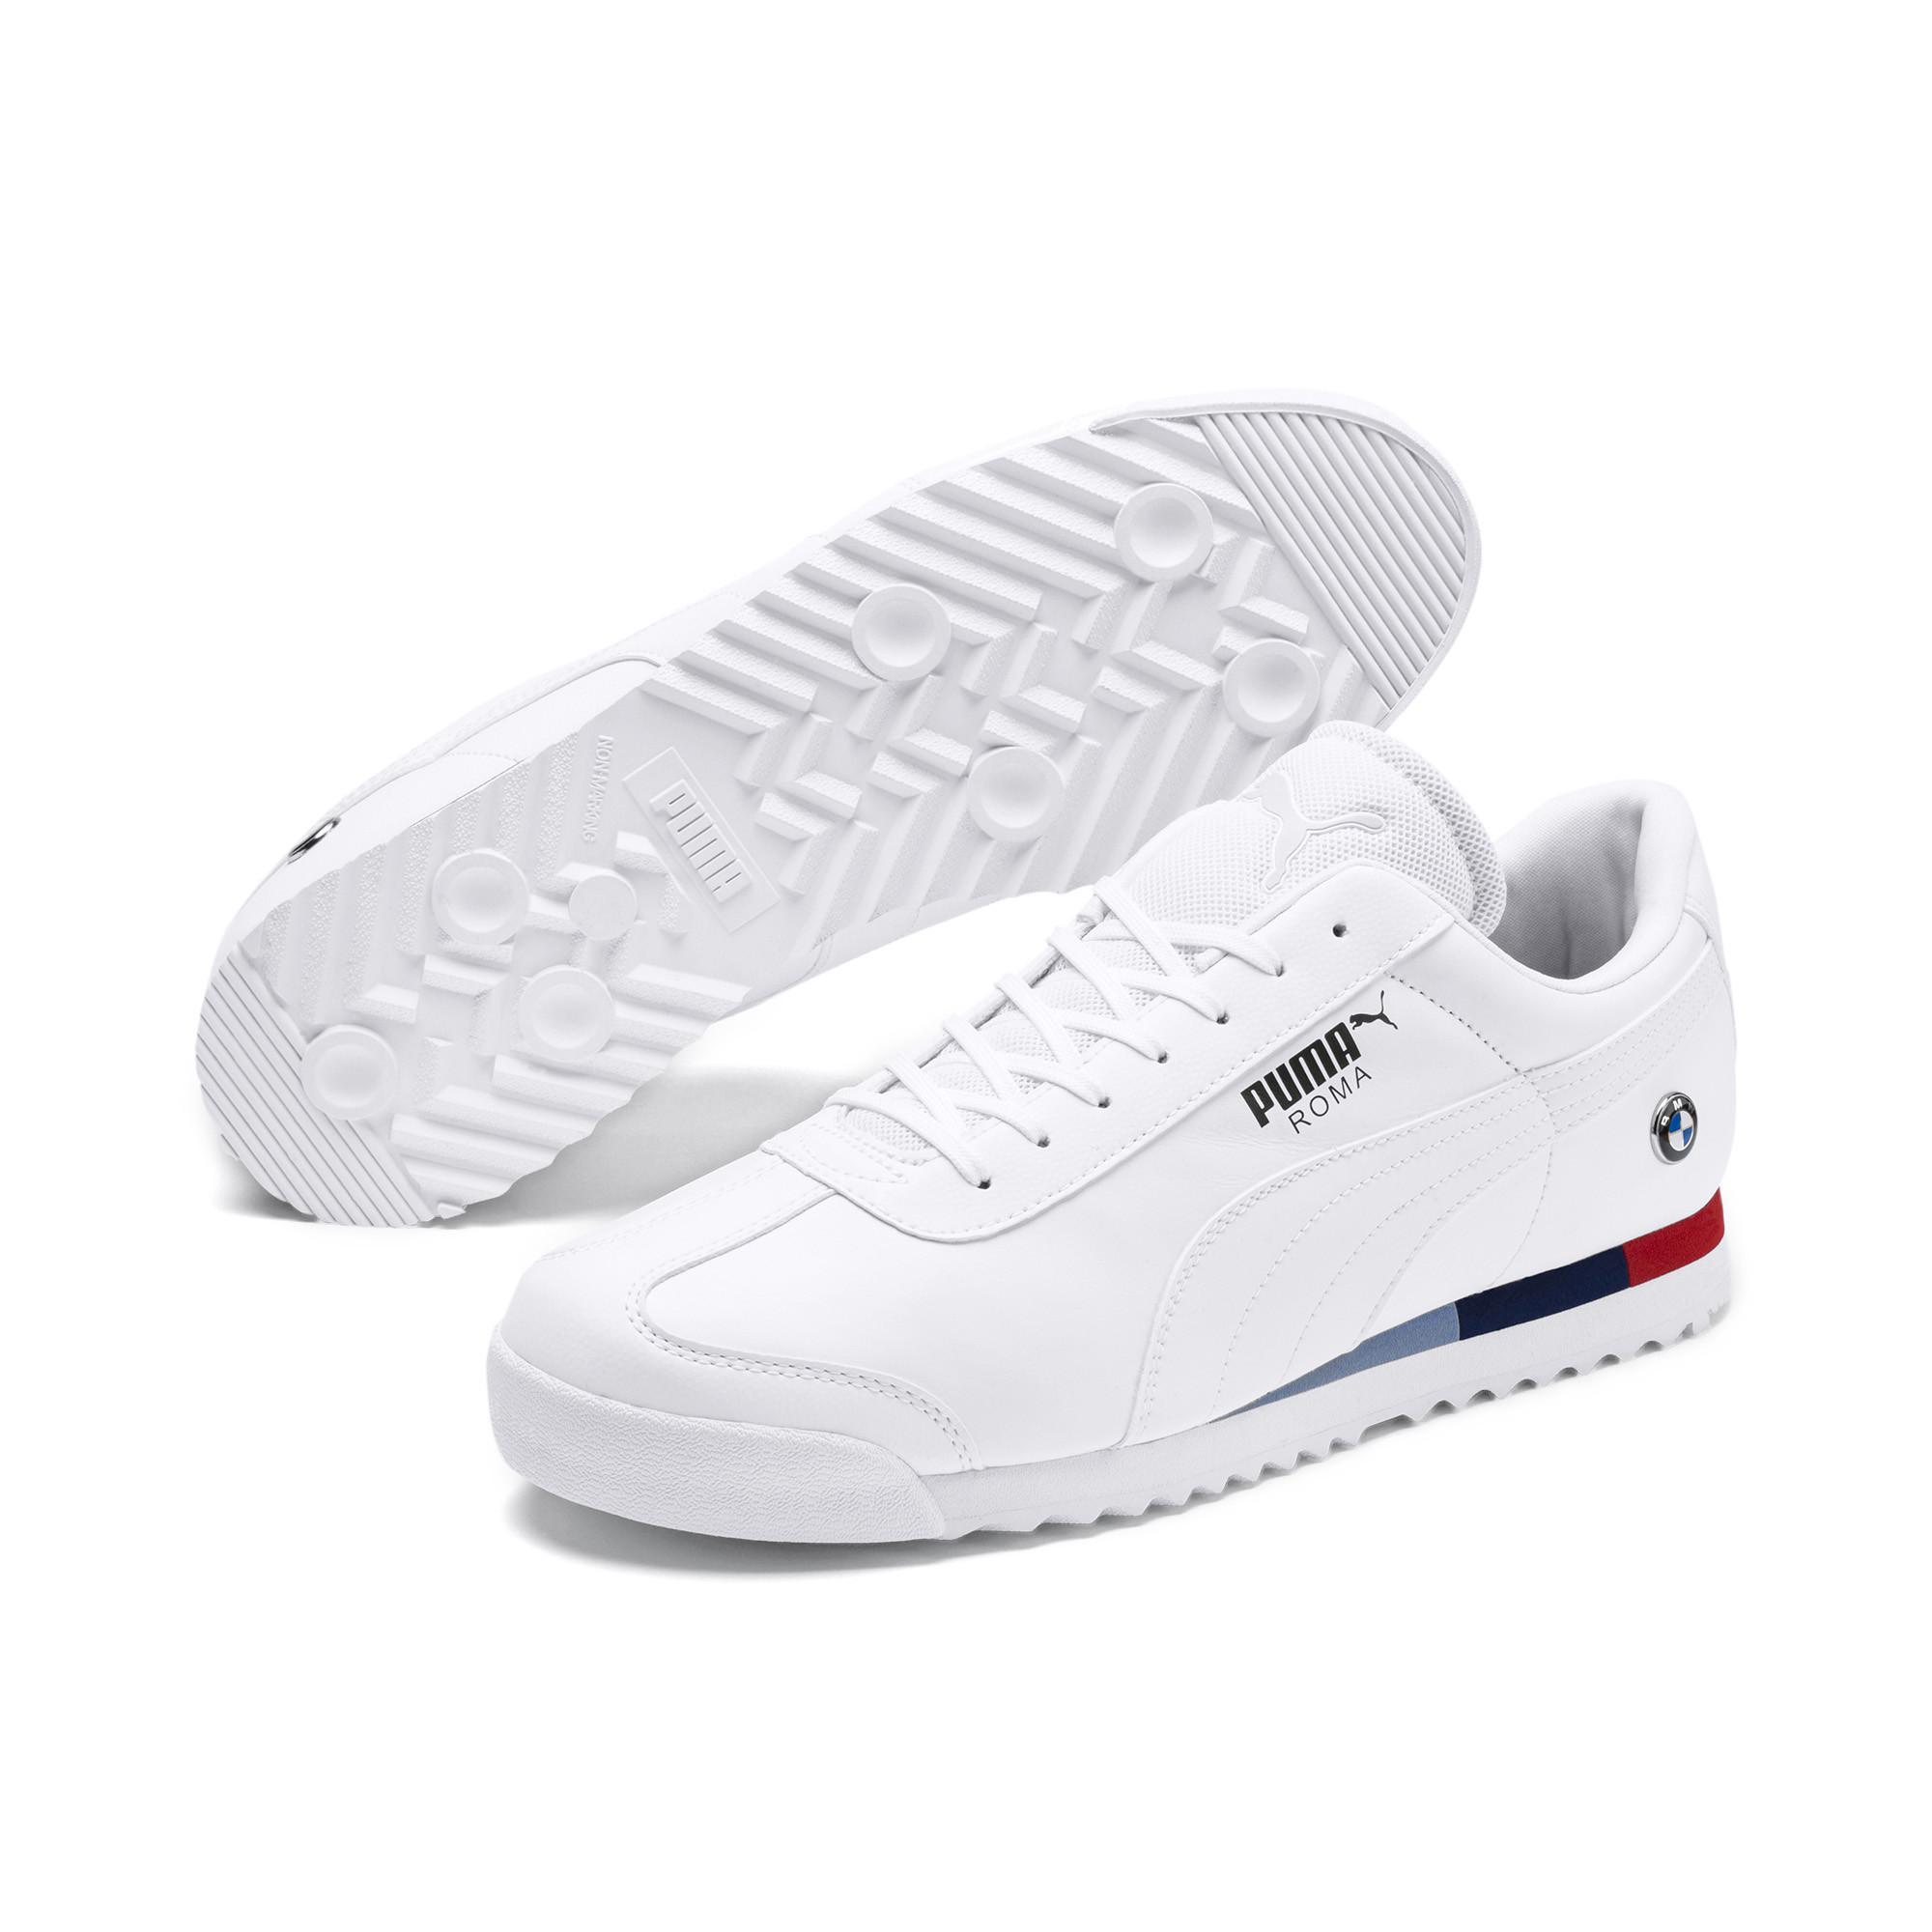 a02d4f6090b201 PUMA - White Bmw Mms Roma Men s Sneakers for Men - Lyst. View fullscreen